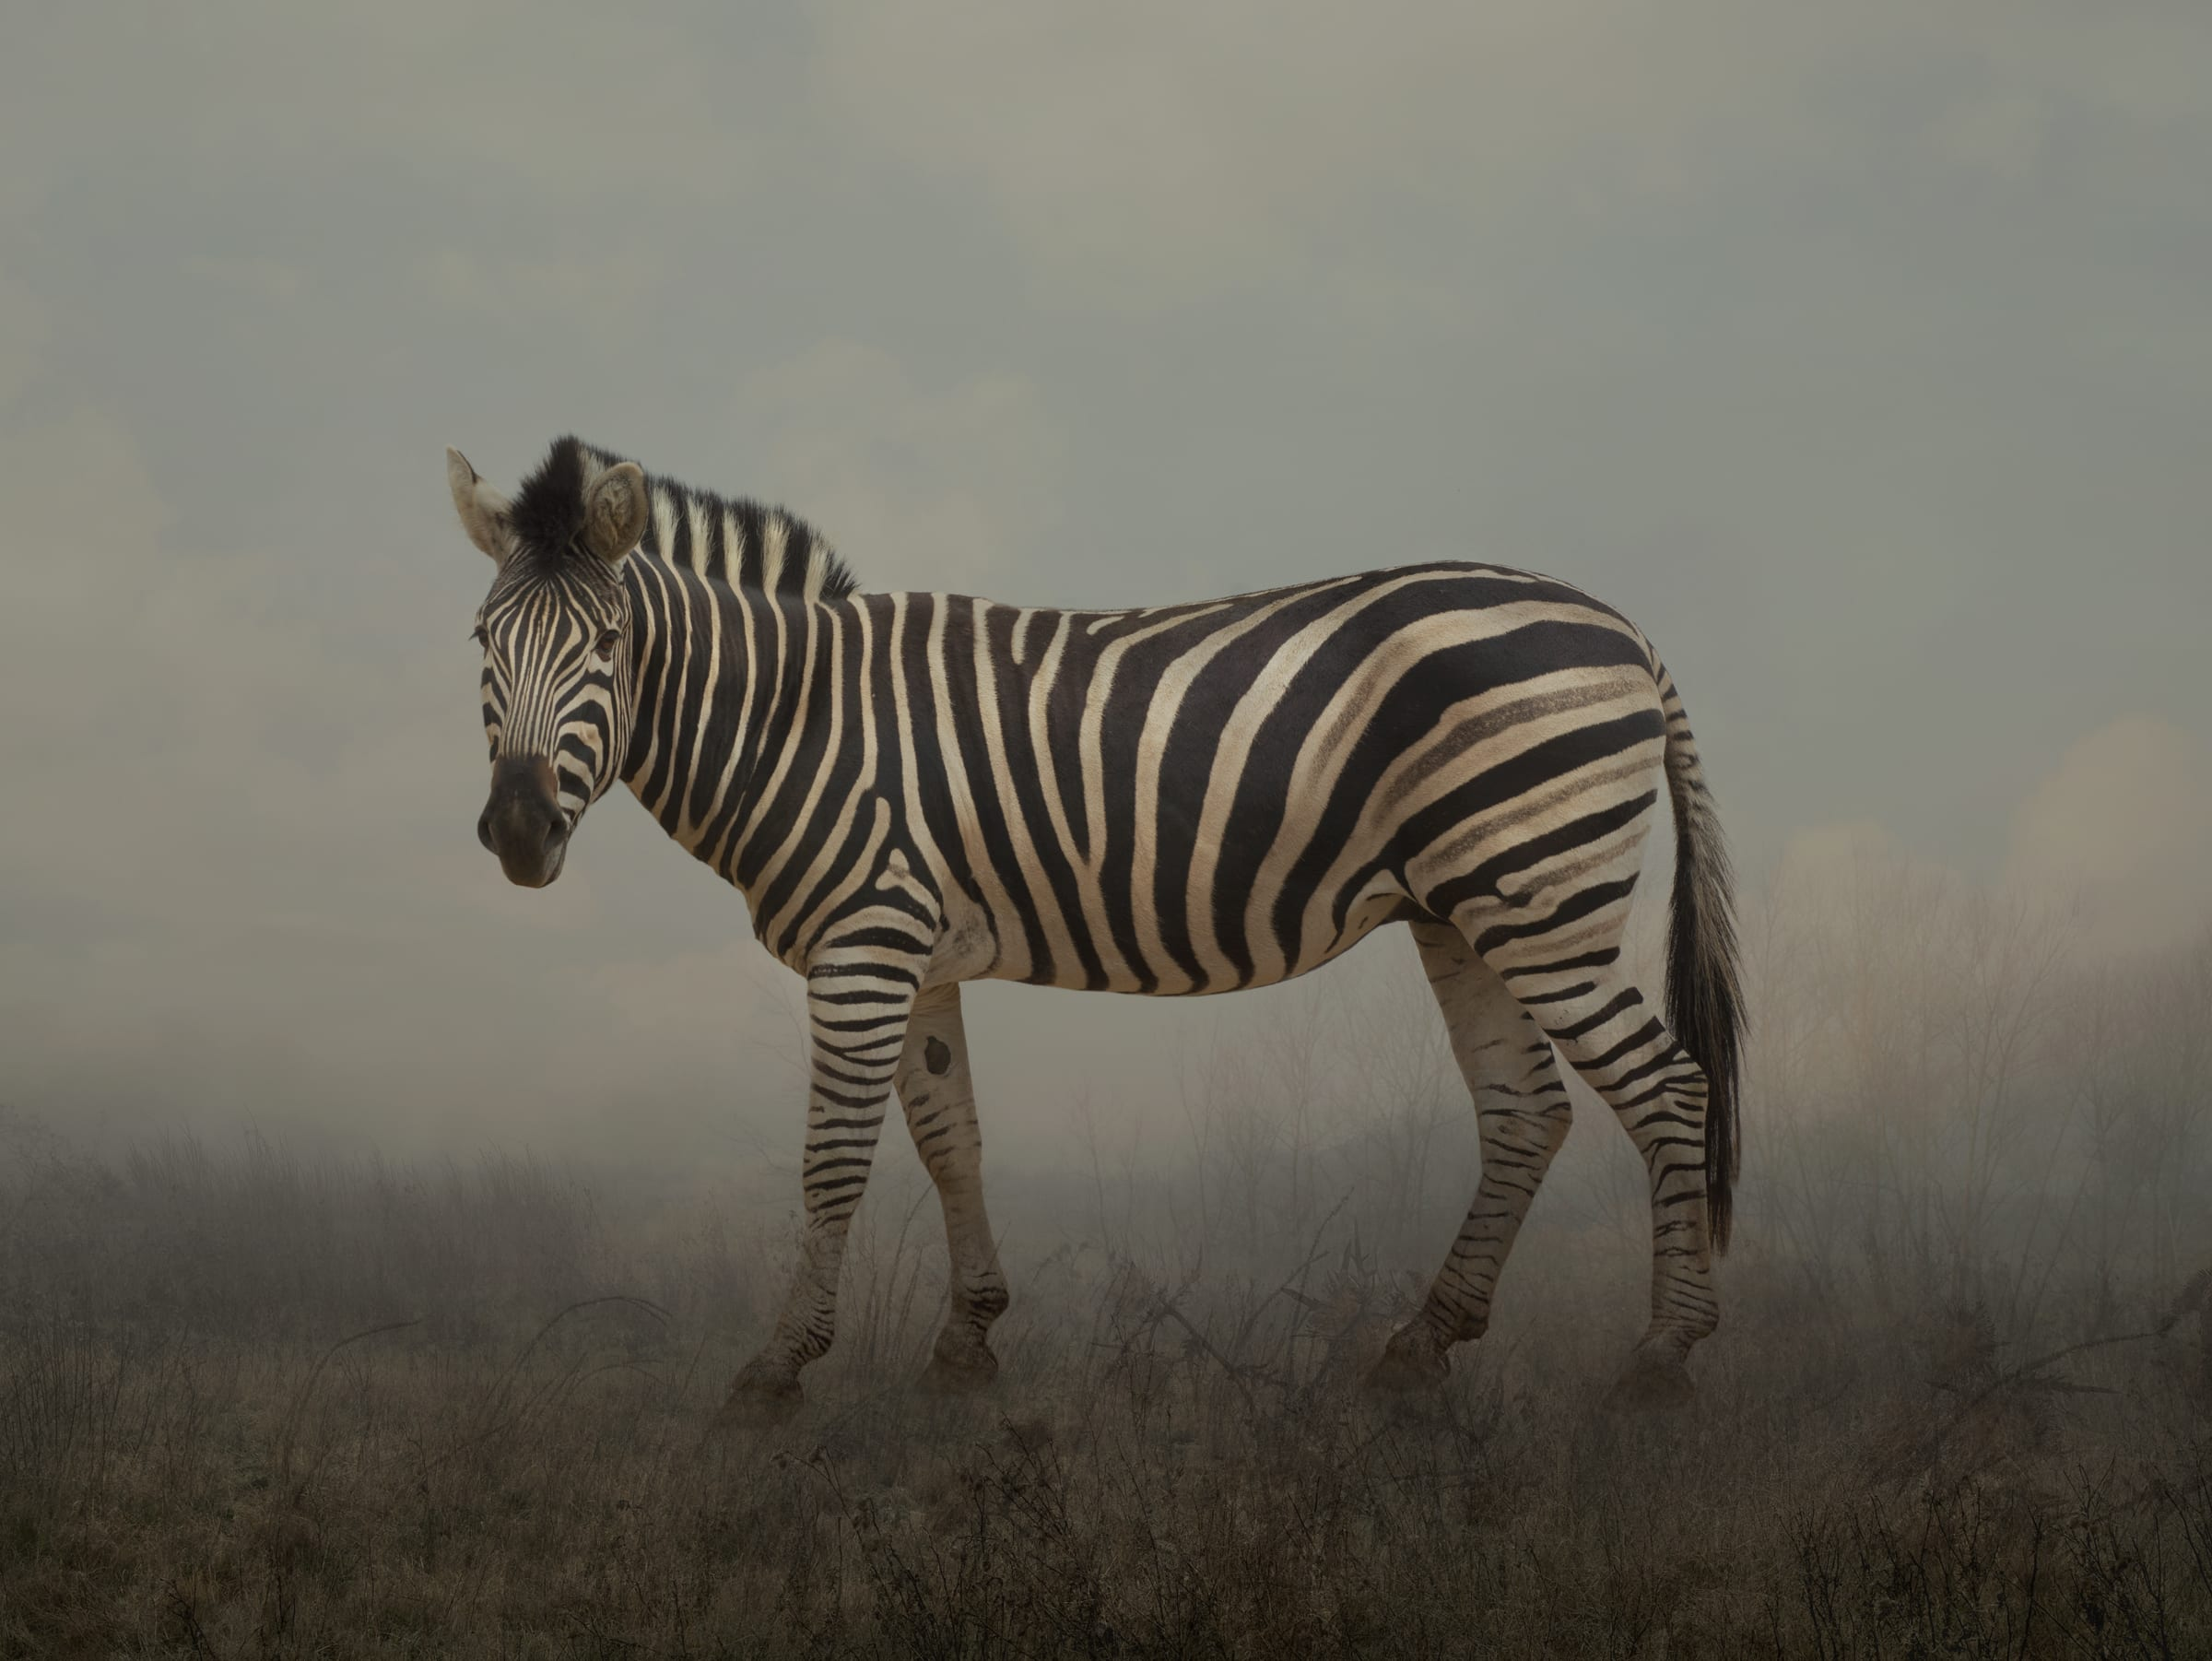 30 964 Free images of Wildlife